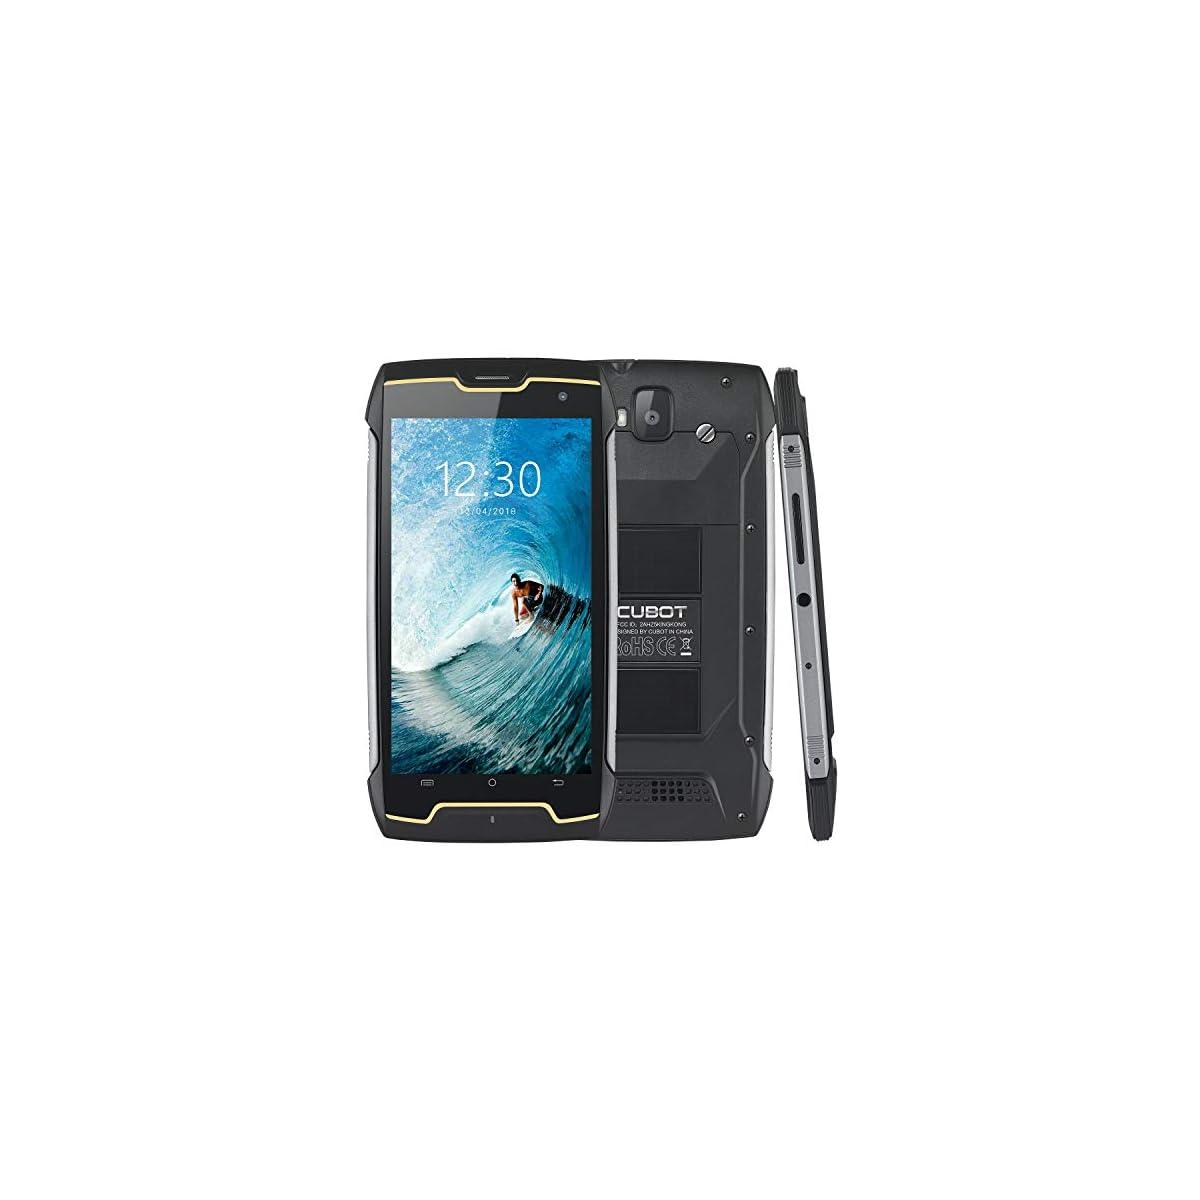 CUBOT King Kong (2018) IP68 Waterproof Rugged Smartphone Unlocked, 4400mAh  Big Battery, 3G WCDMA Dual-SIM, Android 7 0, 2GB RAM+16GB,Compass+GPS,